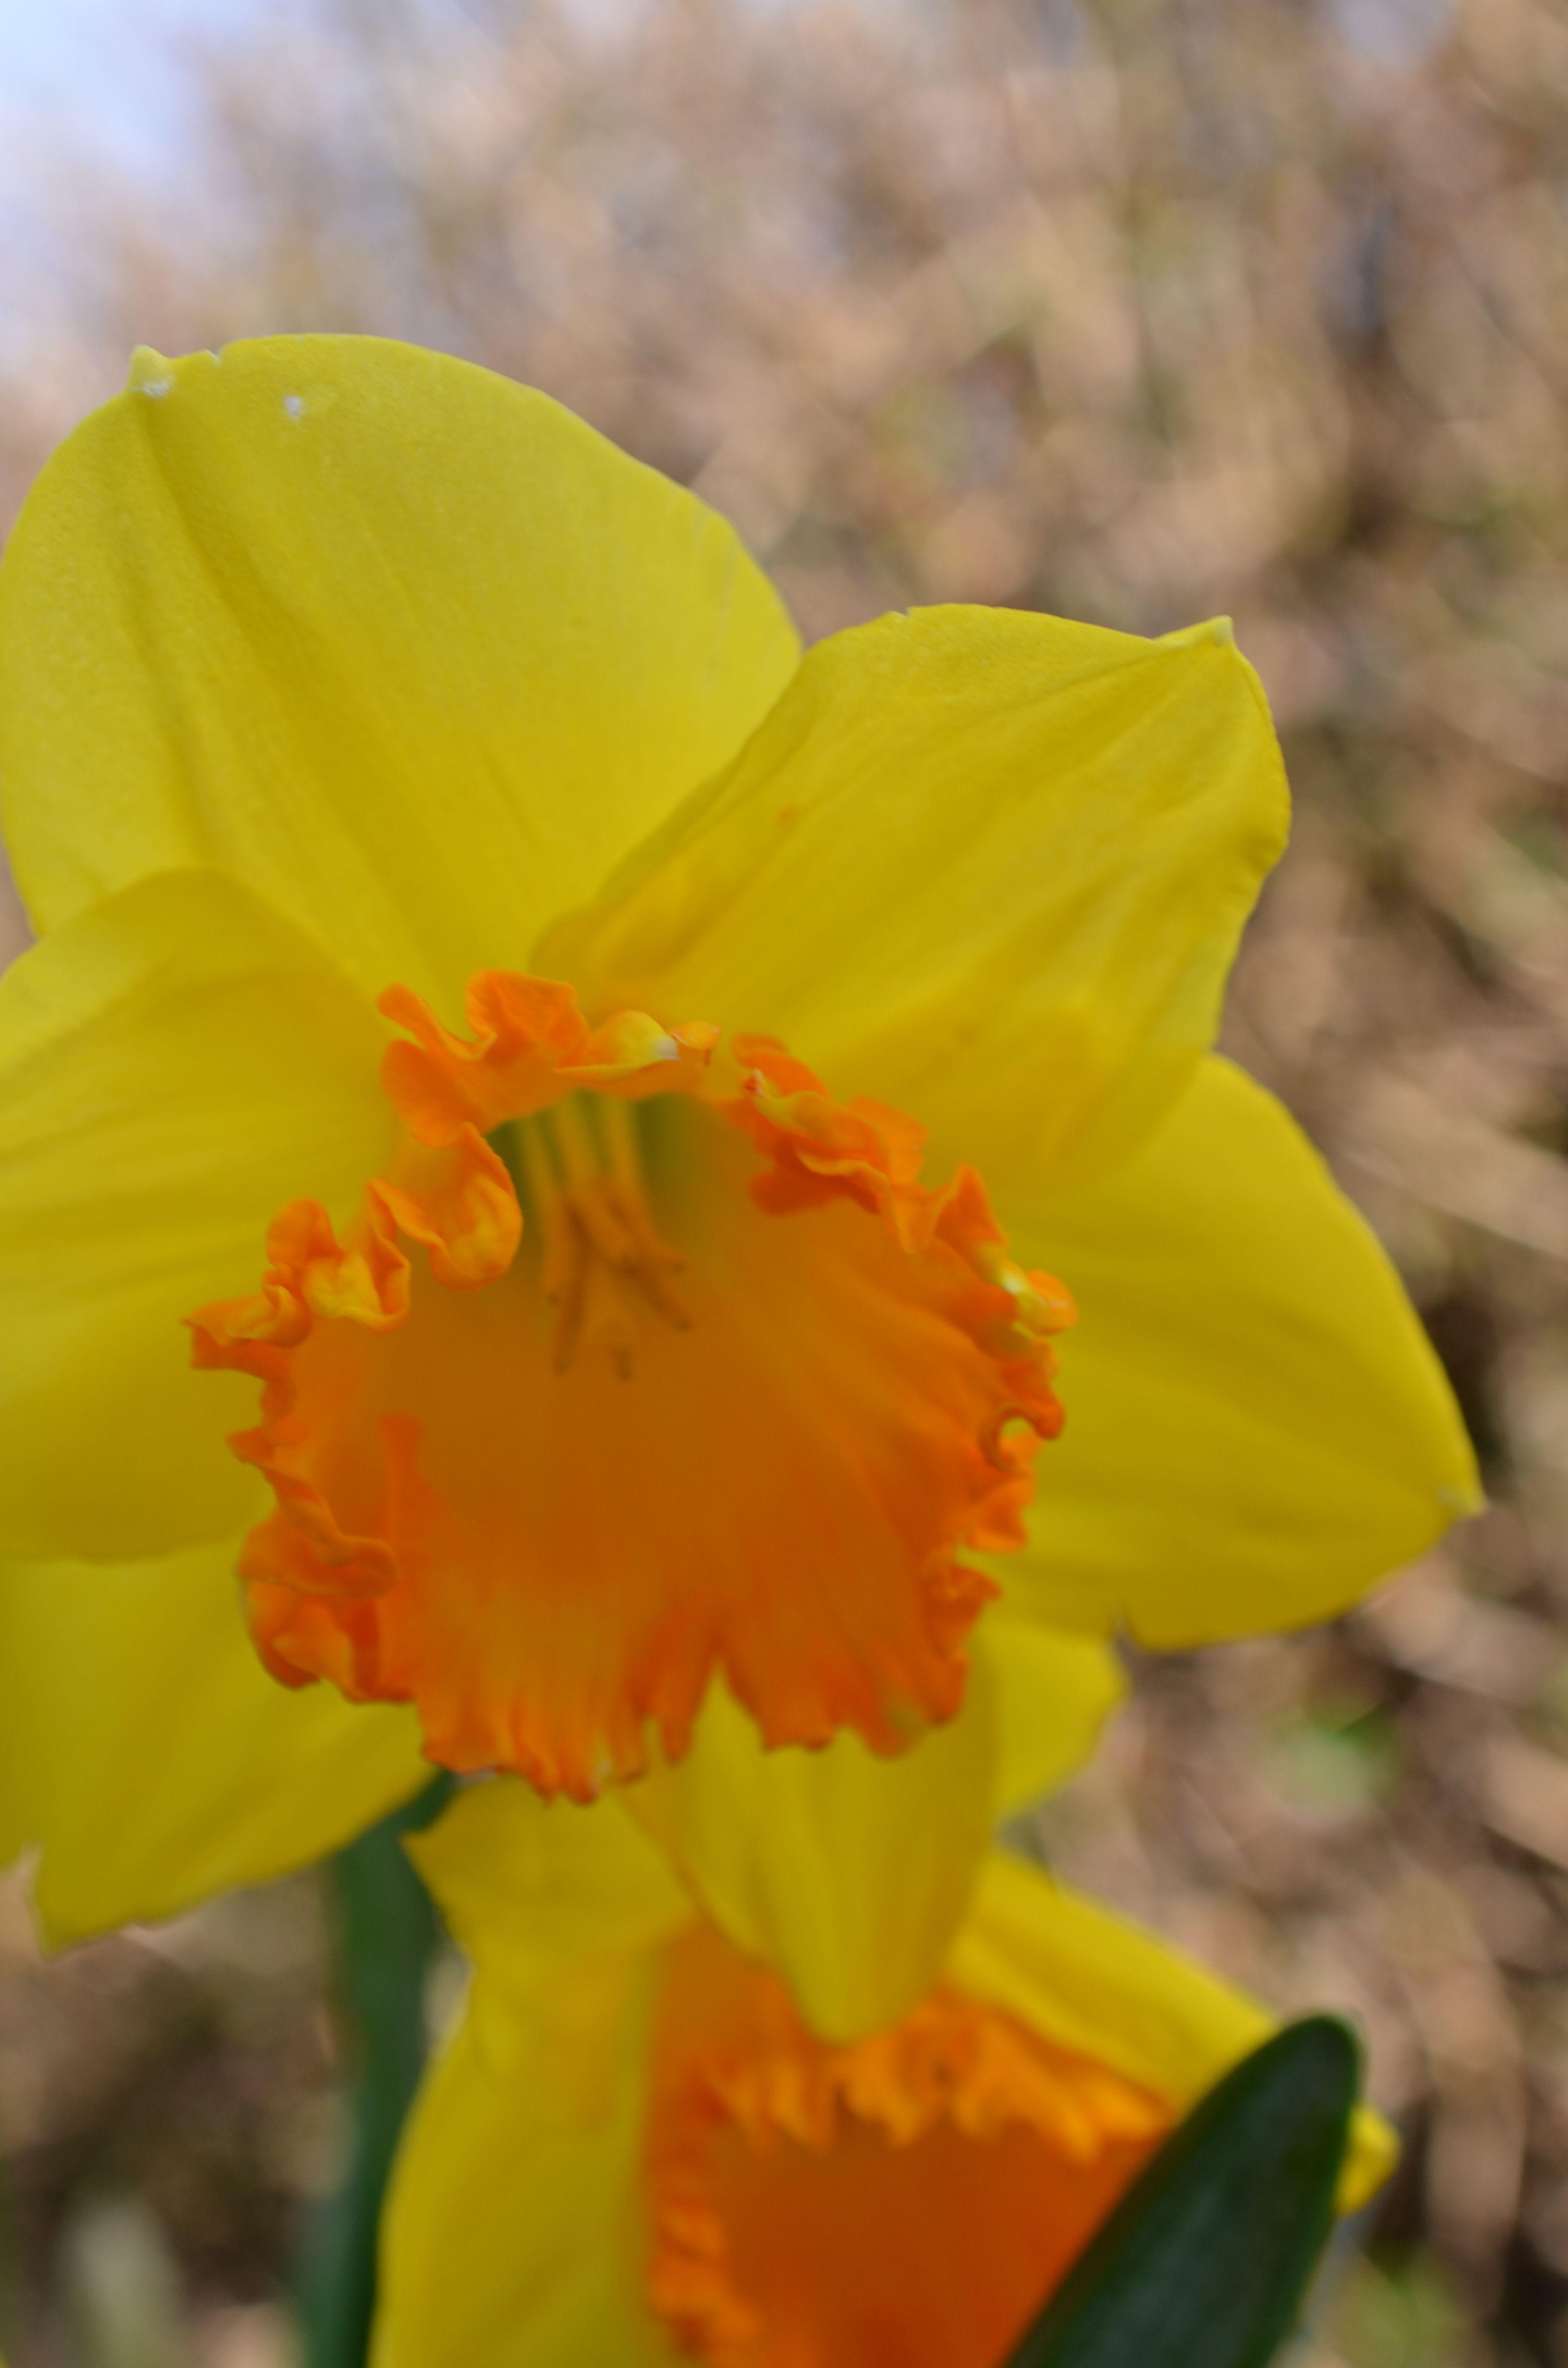 Daffodils Daffodils Pinterest Daffodils Flowers And Beautiful